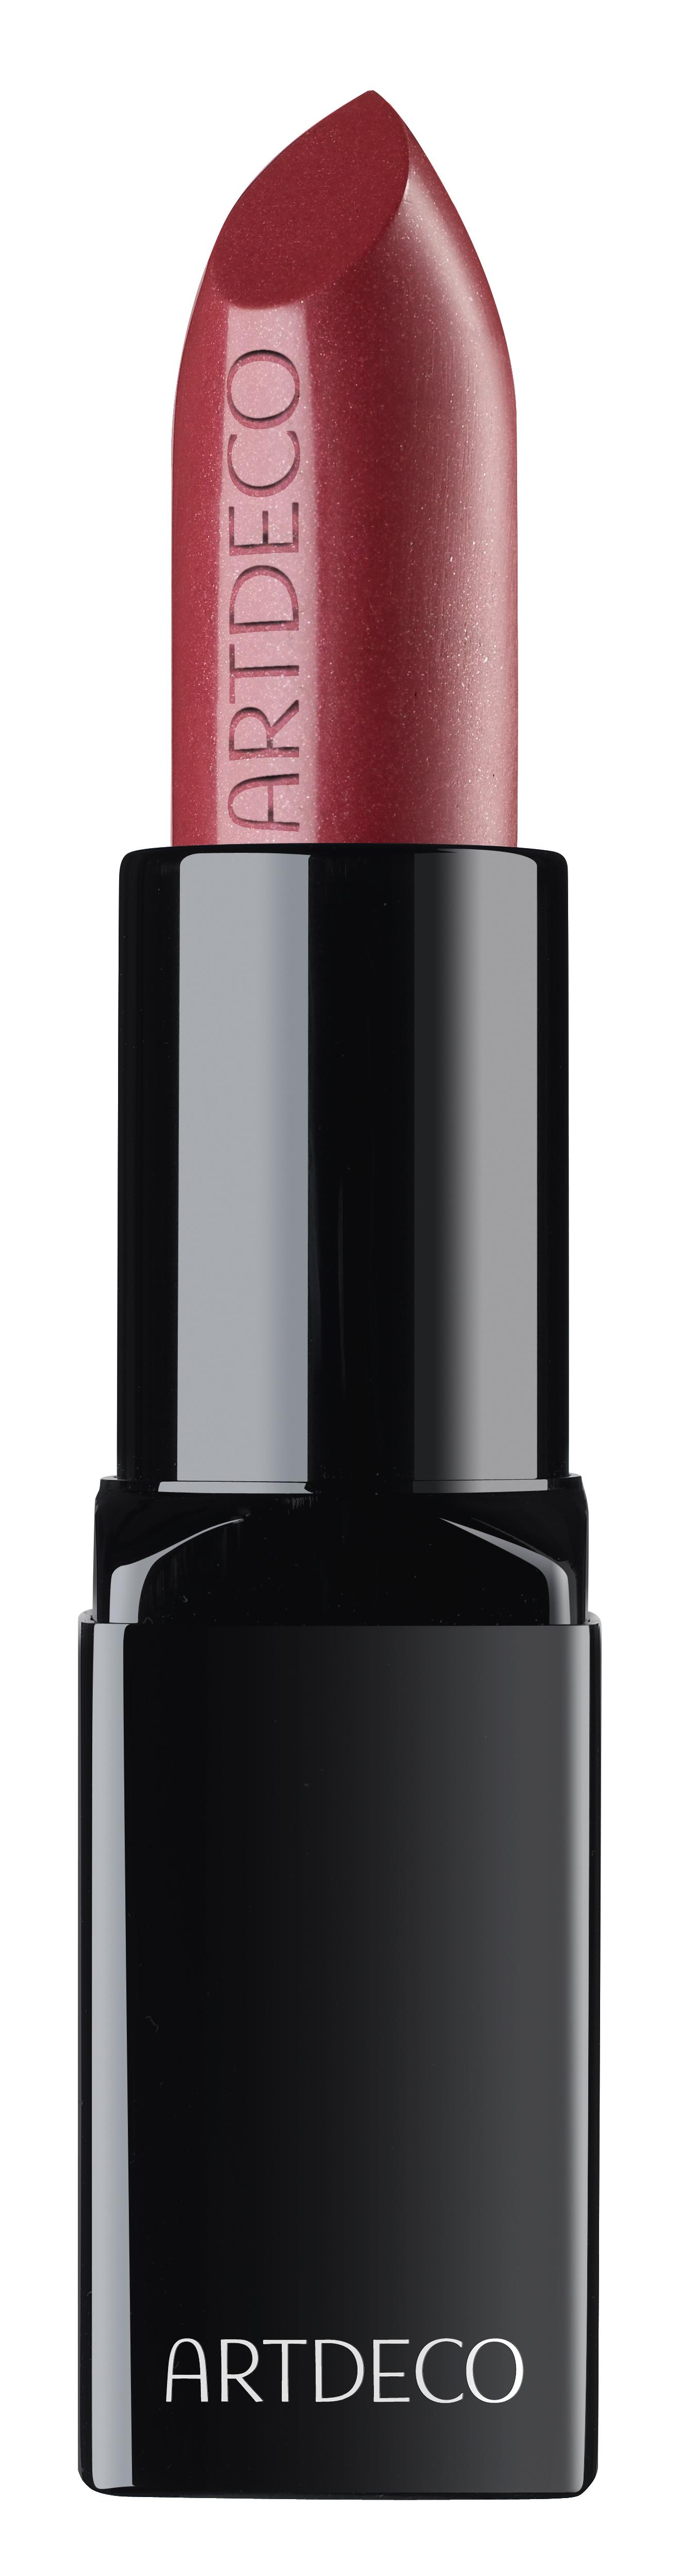 Lipstick310.jpg